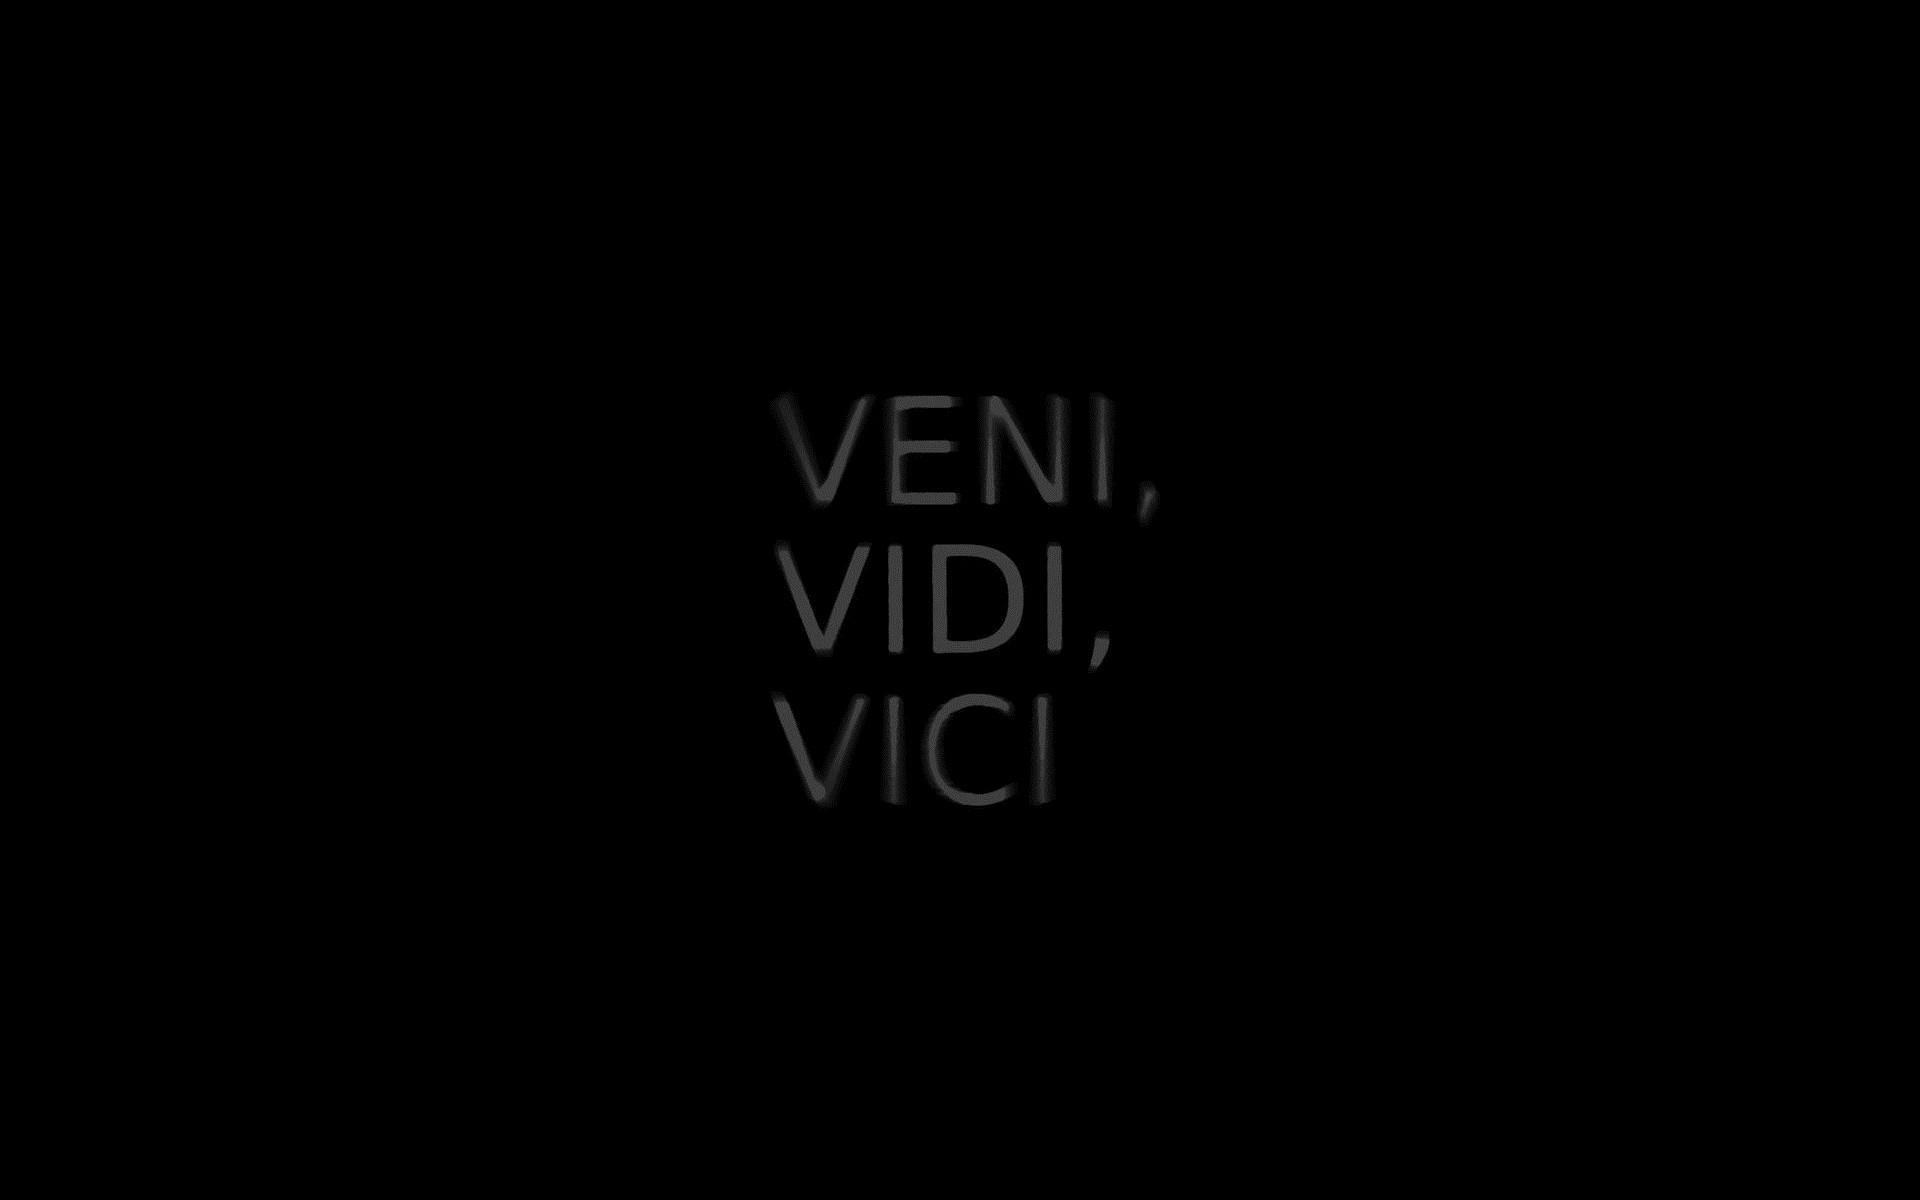 Black minimalistic text quotes backgrounds black - Caesar hd wallpaper ...